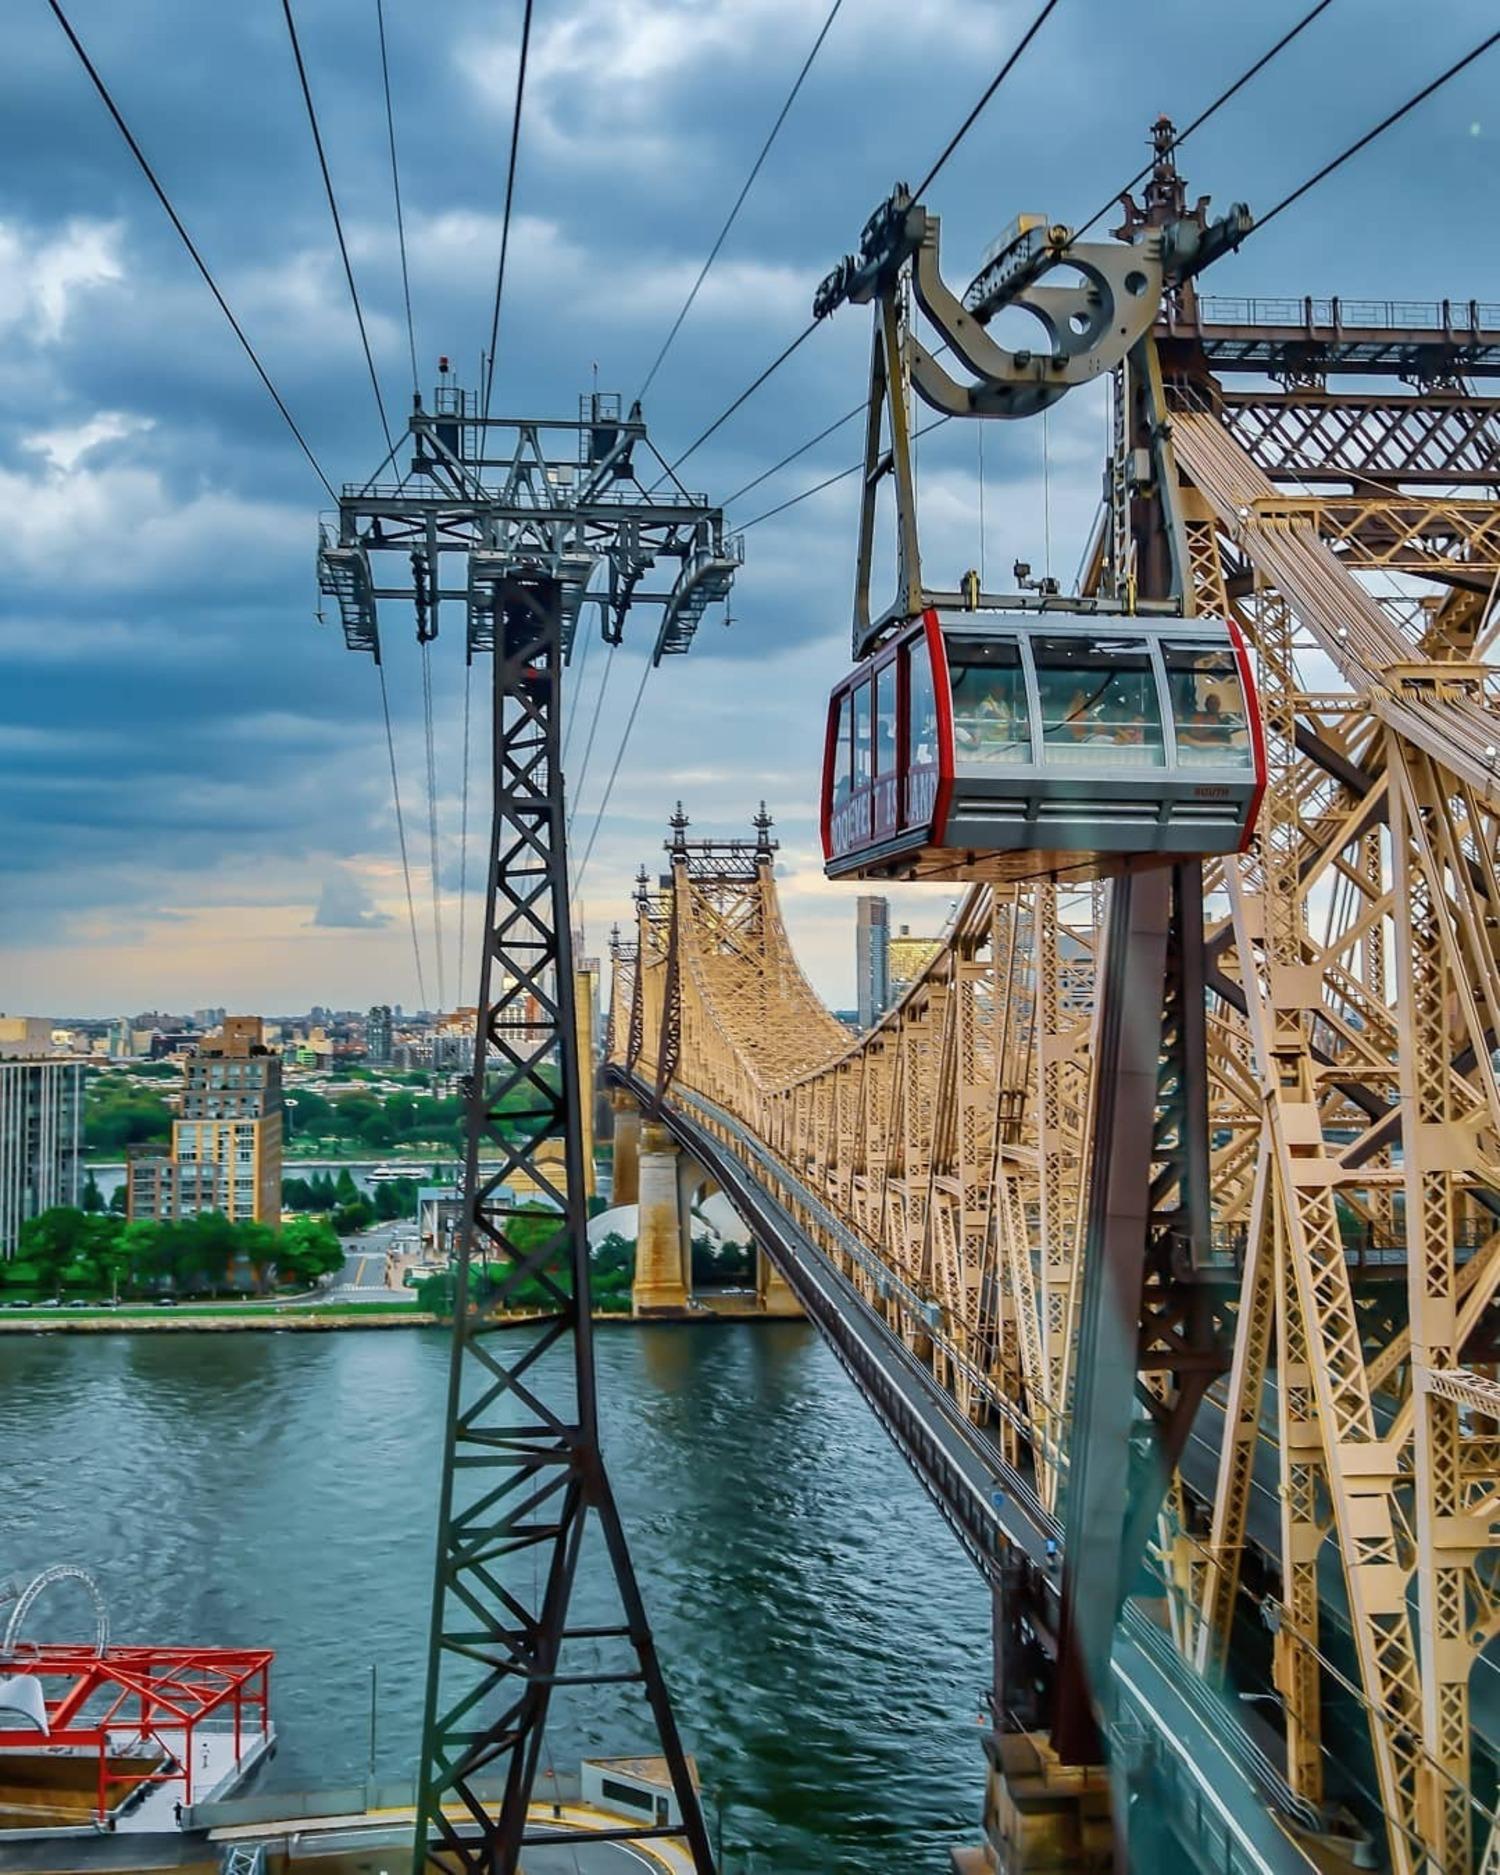 Roosevelt Island Tramway and Queensborough Bridge, New York, New York